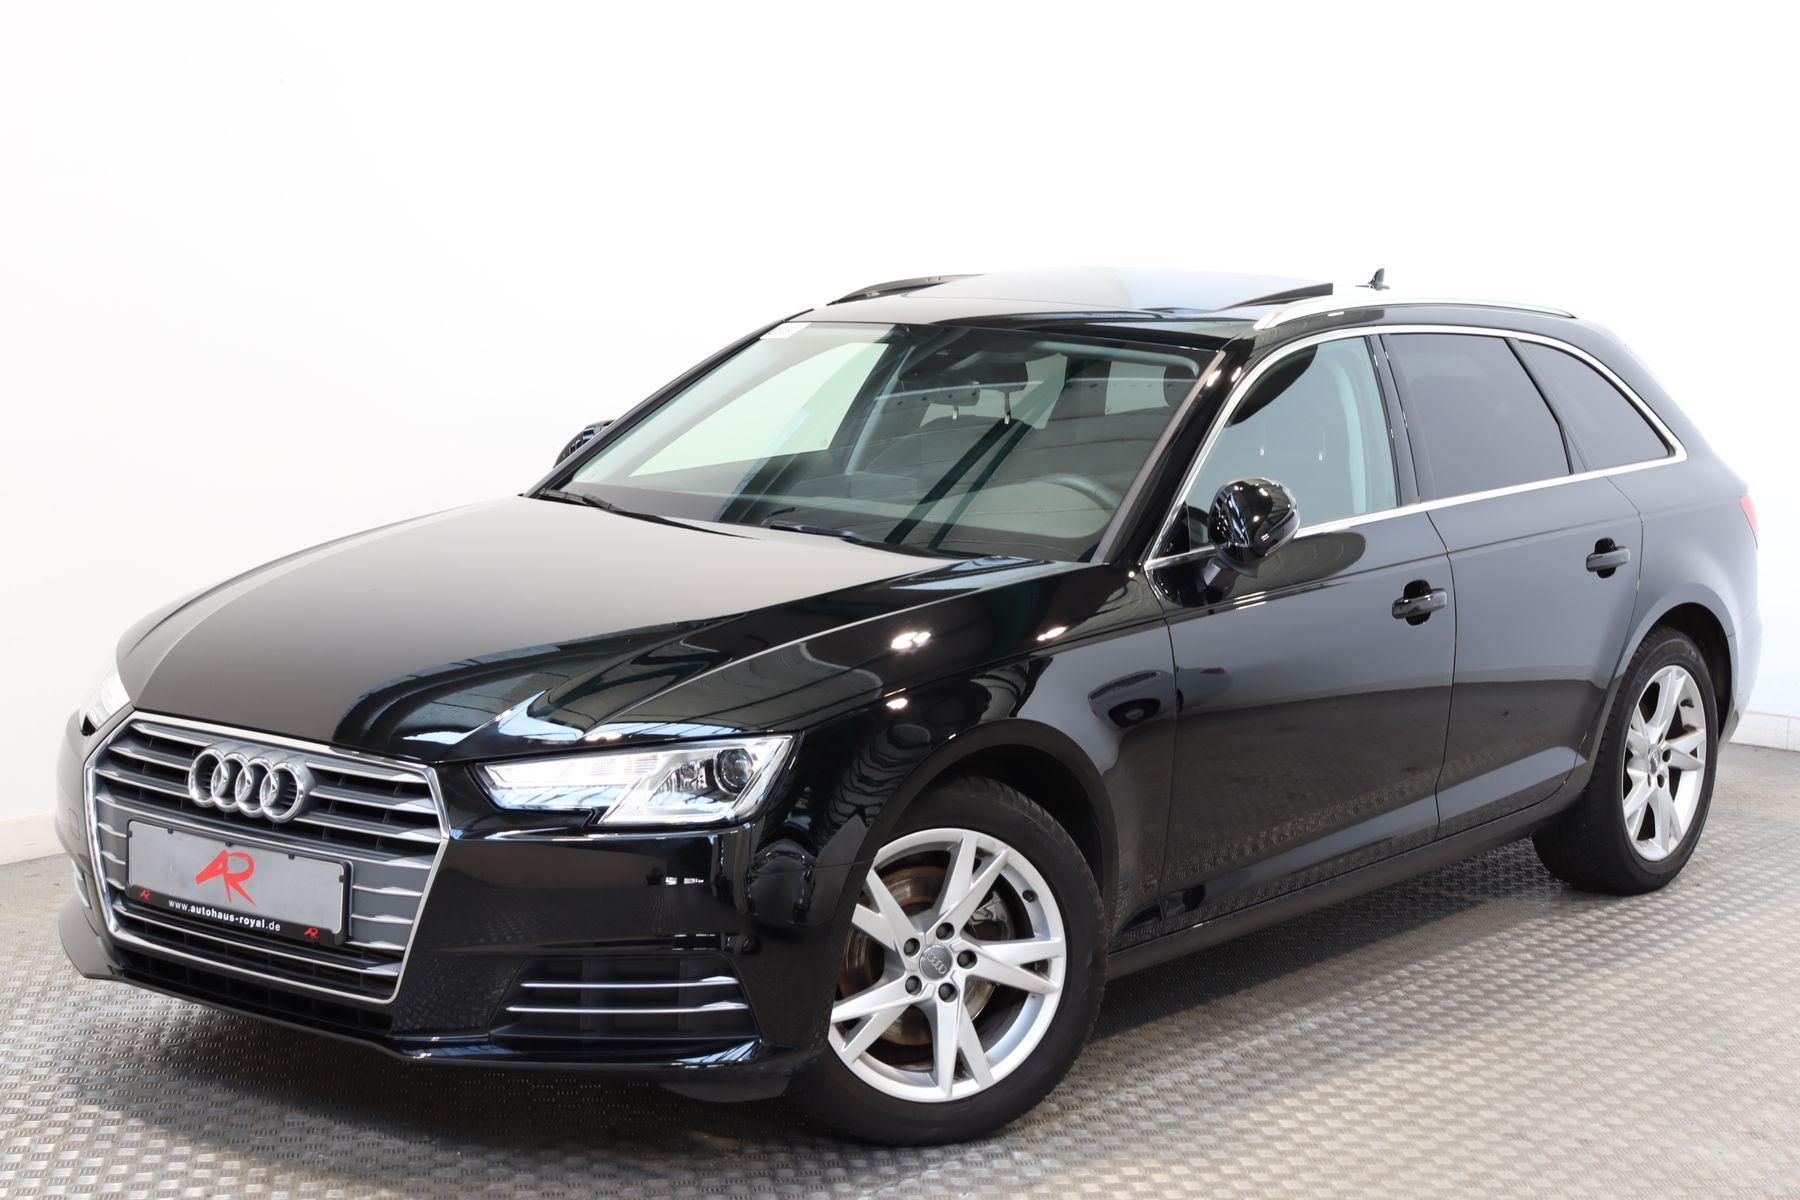 Audi A4 Avant 2.0 TFSI SPORT ALCANTARA,STANDHEIZUNG, Jahr 2018, Benzin